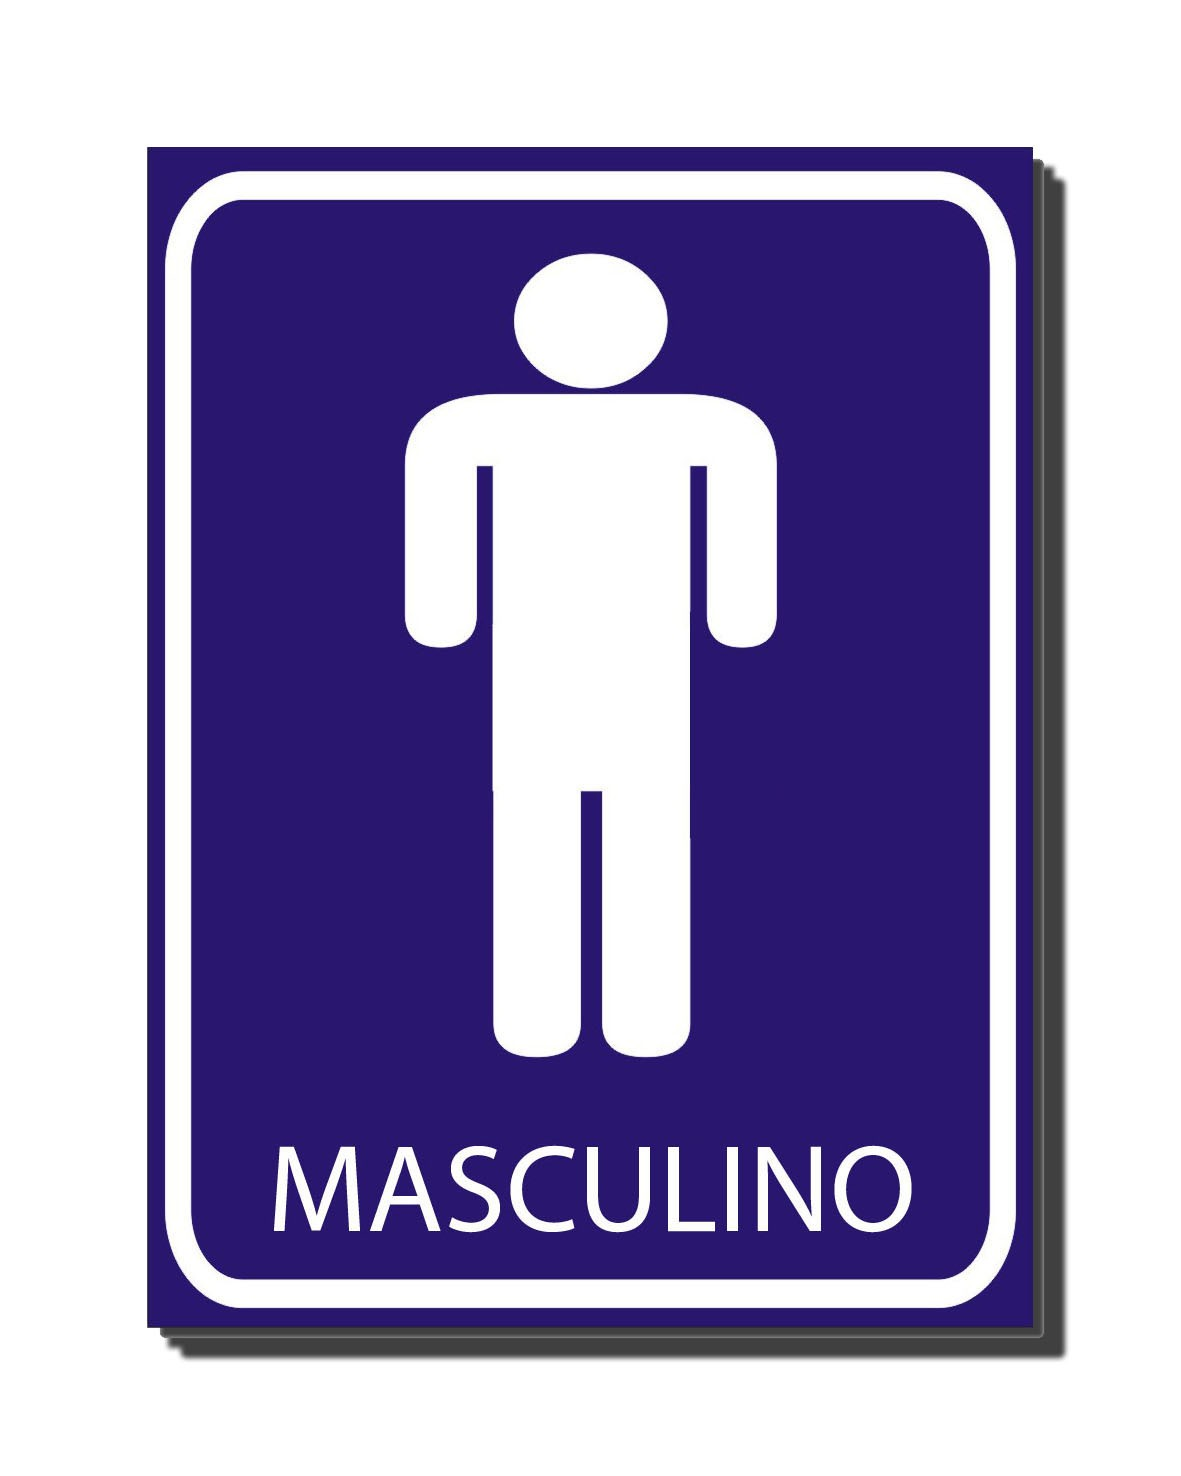 CONTA UMA Banheiro Masculino -> Banheiro Feminino E Masculino Placa